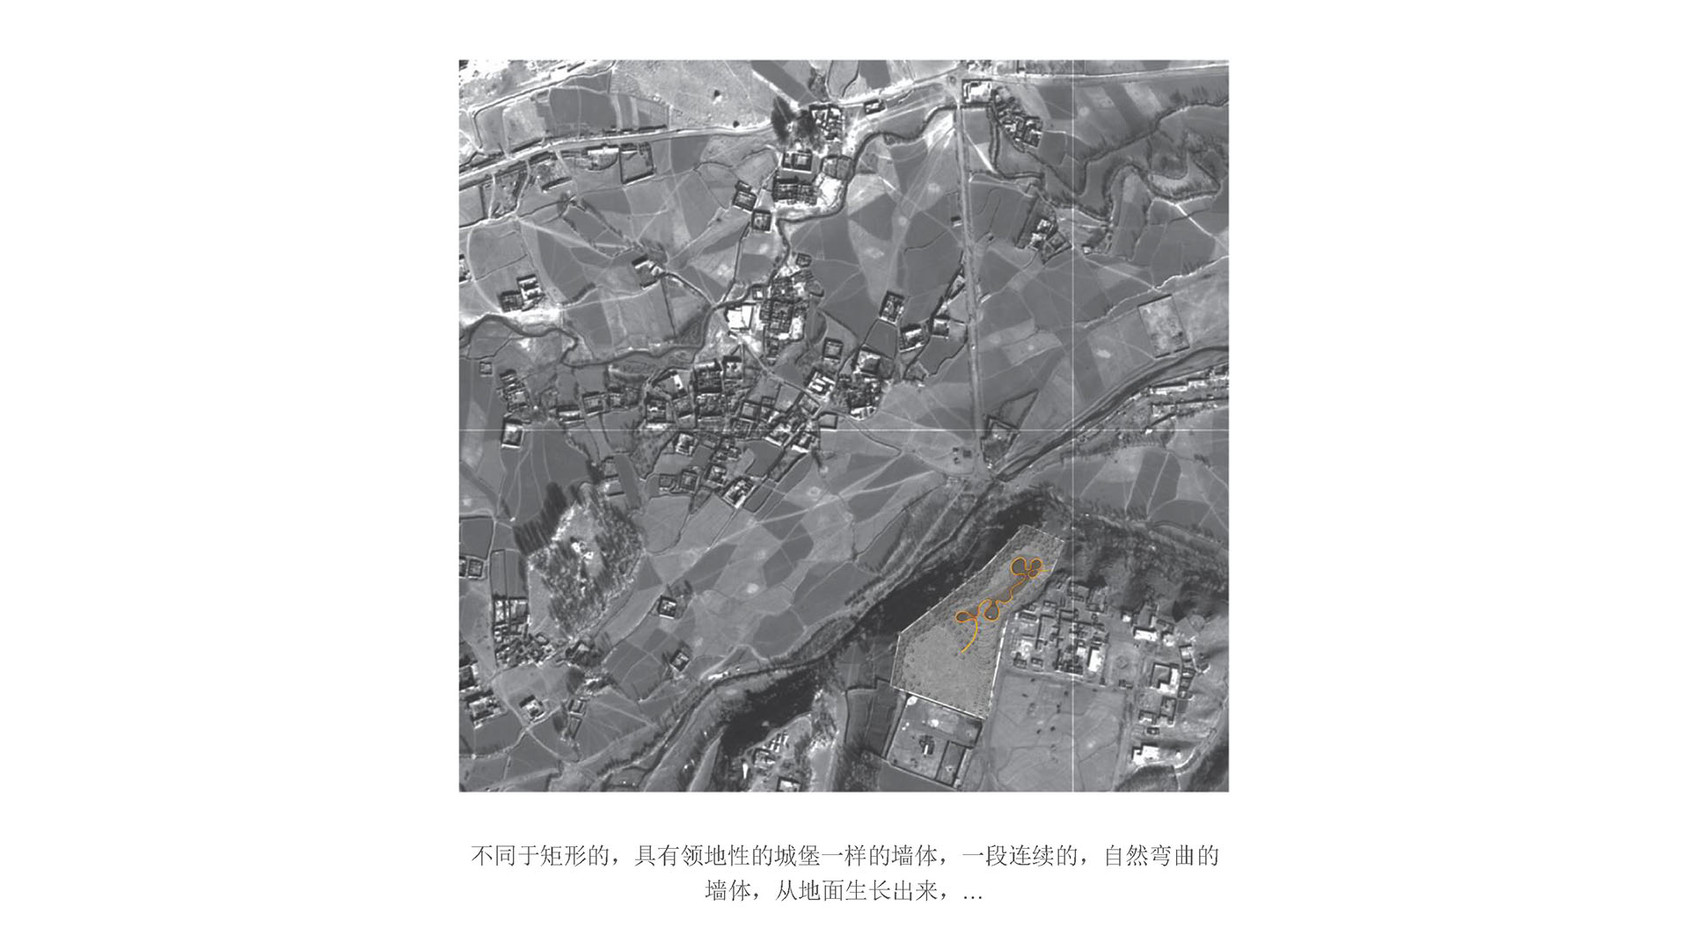 BAMIYAN-CULTURAL-CENTRE-CN_03.jpg